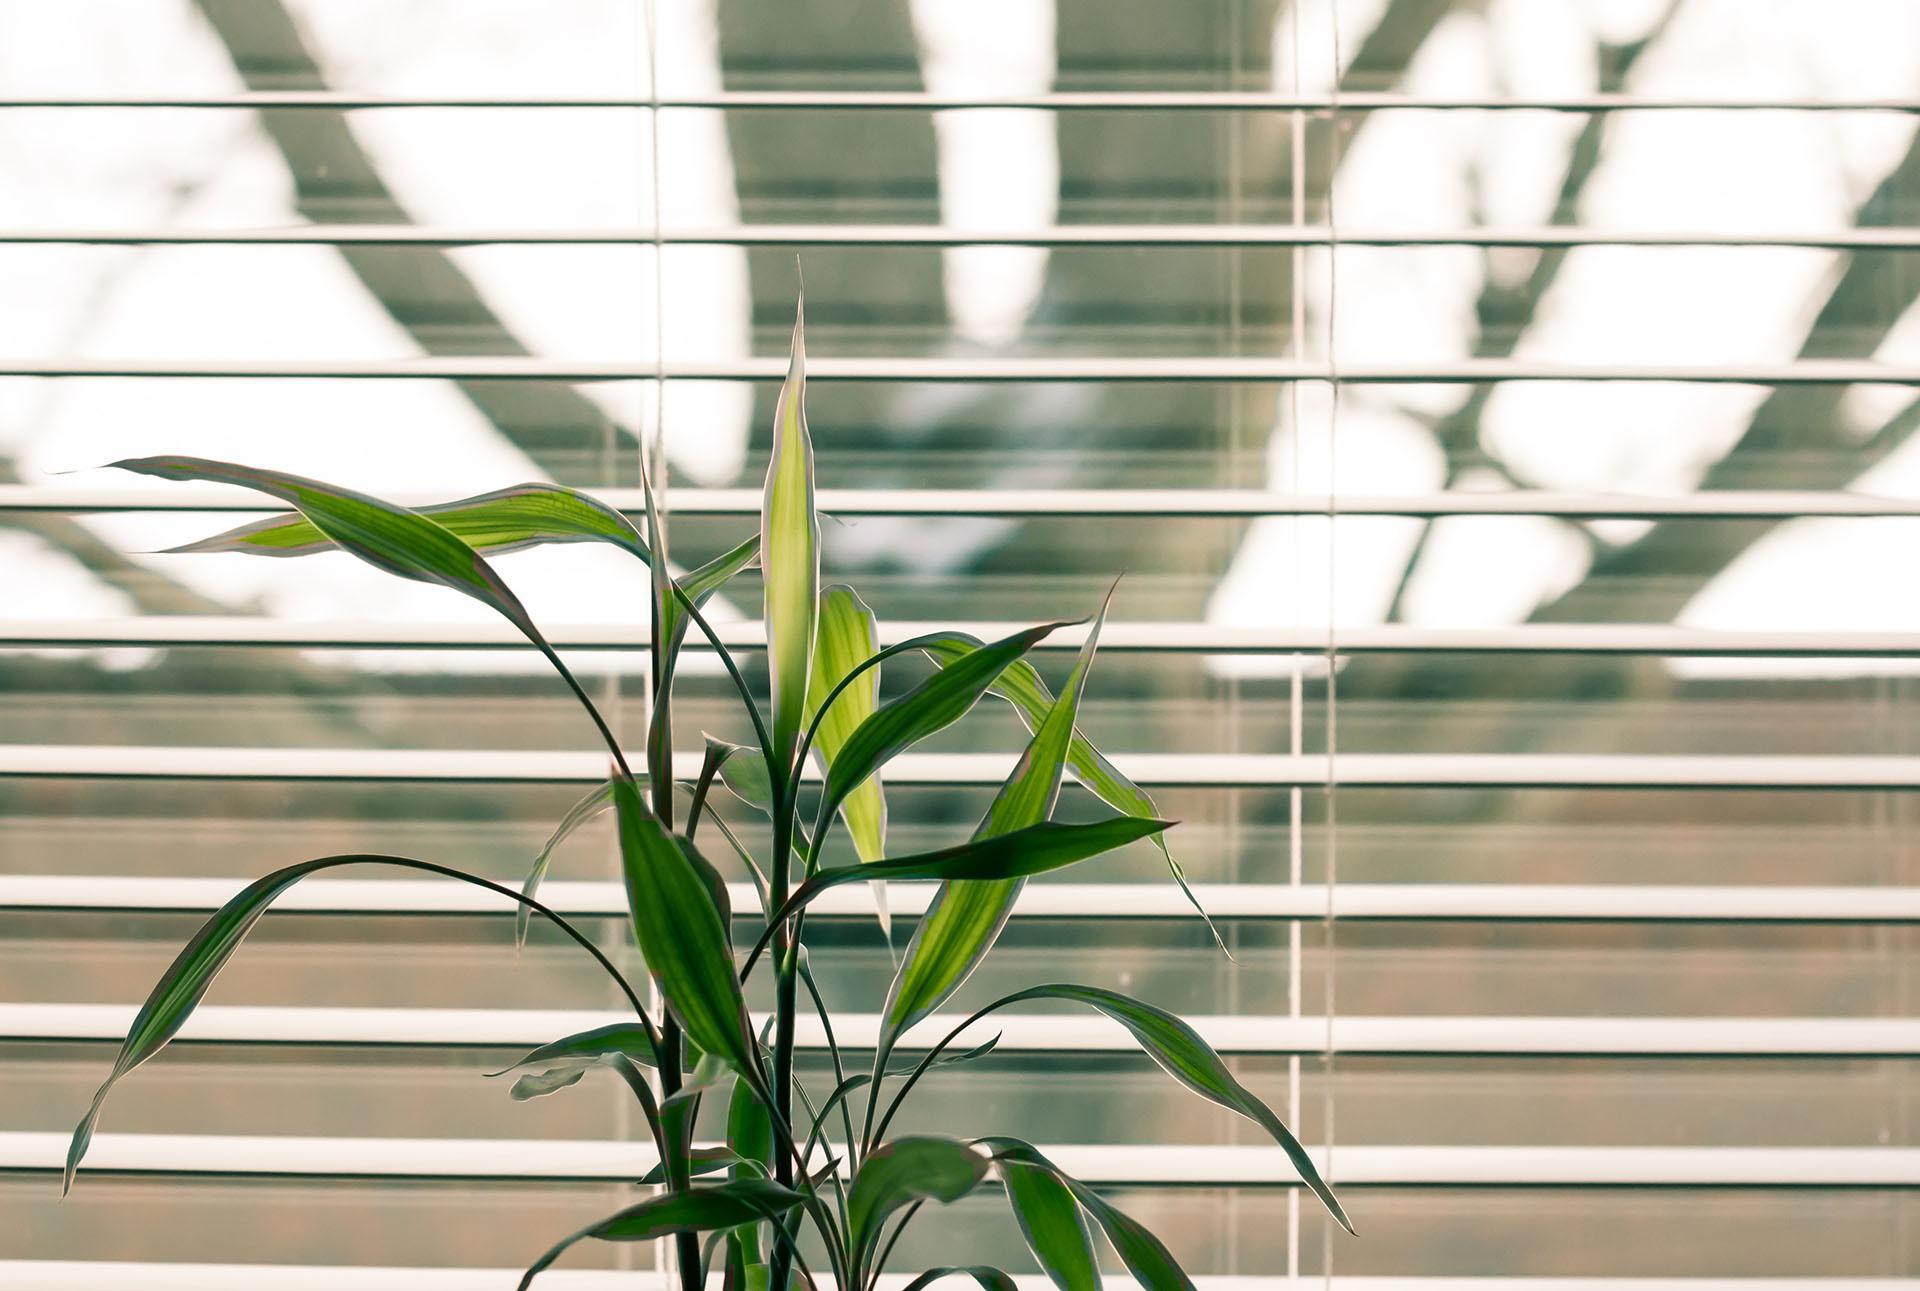 Květina u okna s žaluziemi